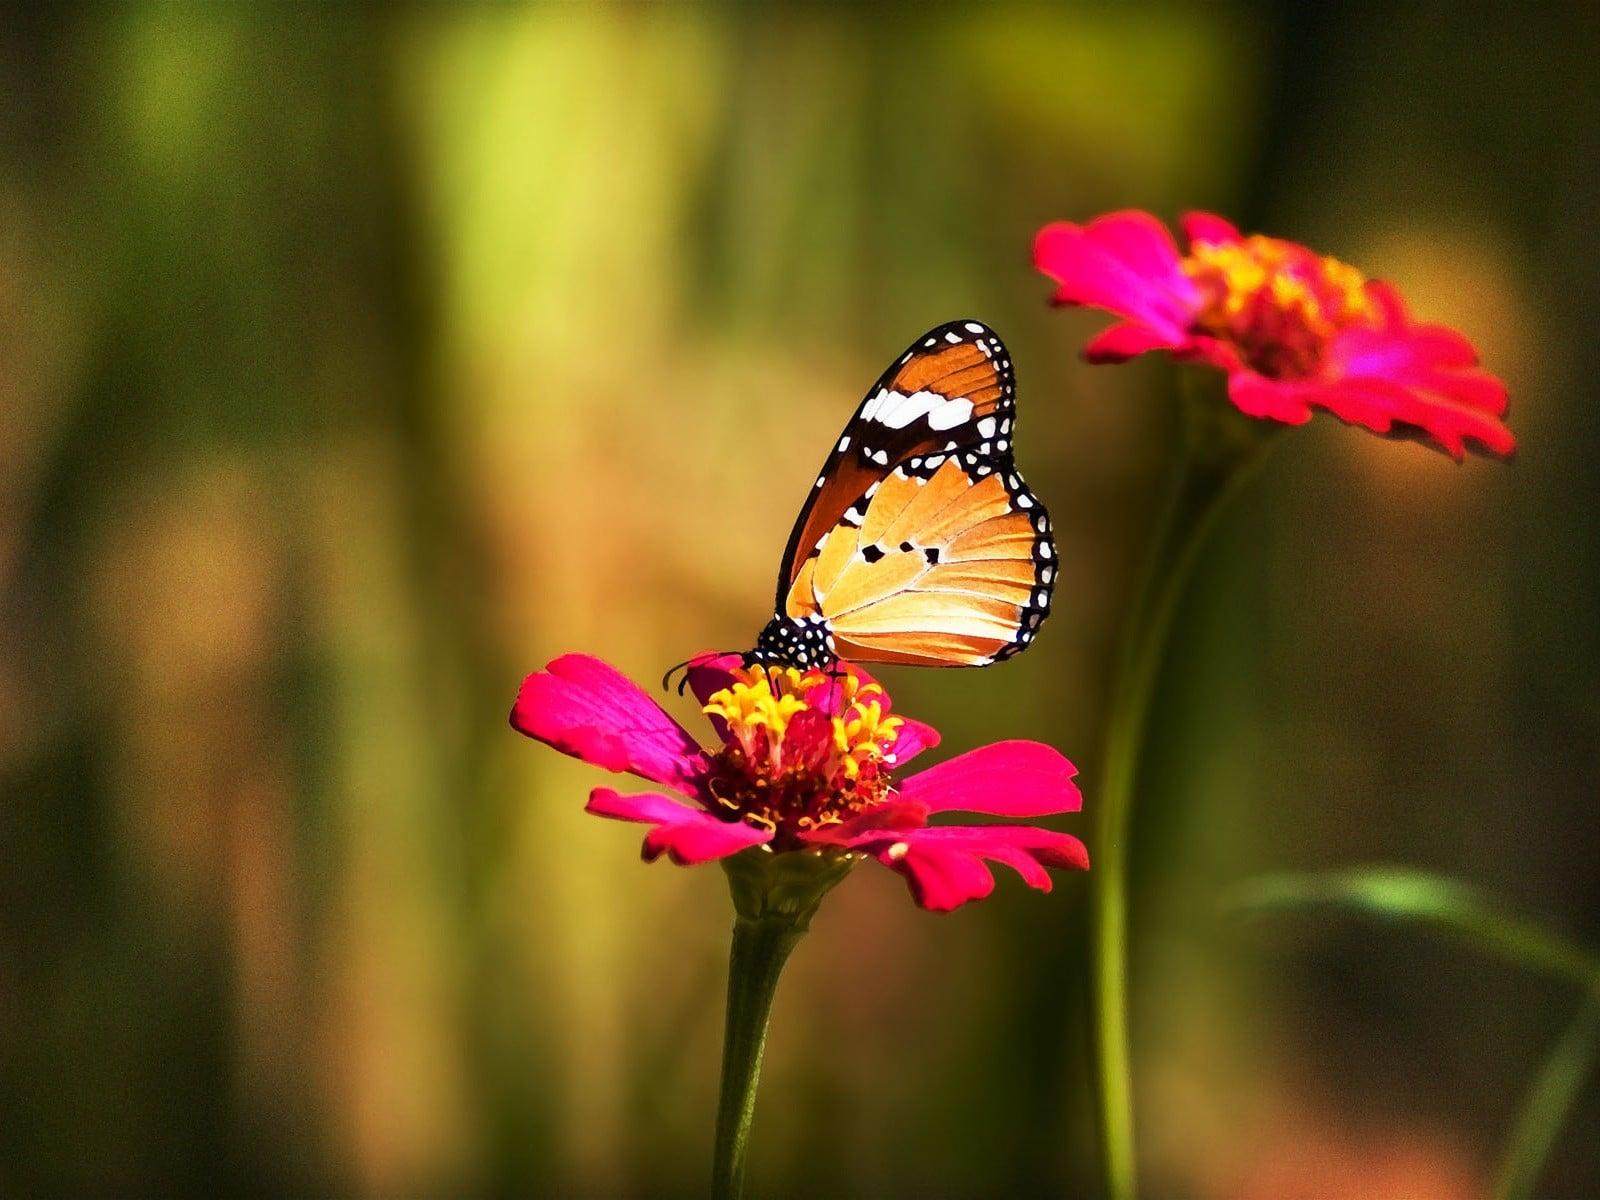 o imagine superba cu fluturi